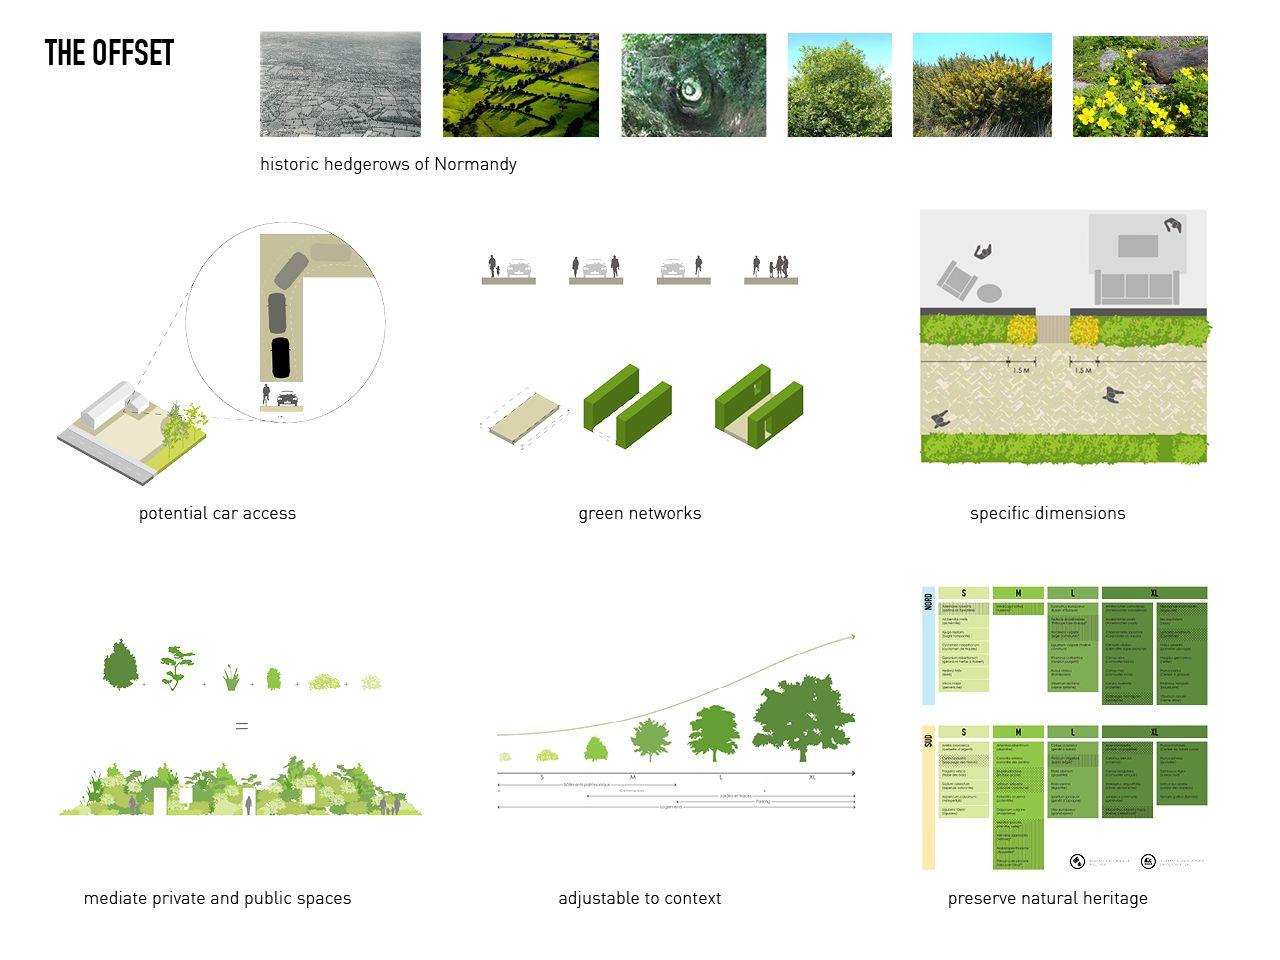 Gallery Of Mvrdv Releases New Images Of 600 Hectare La Grande Mosaique Masterplan In Caen 17 Urban Landscape Design Urban Design Diagram Caen